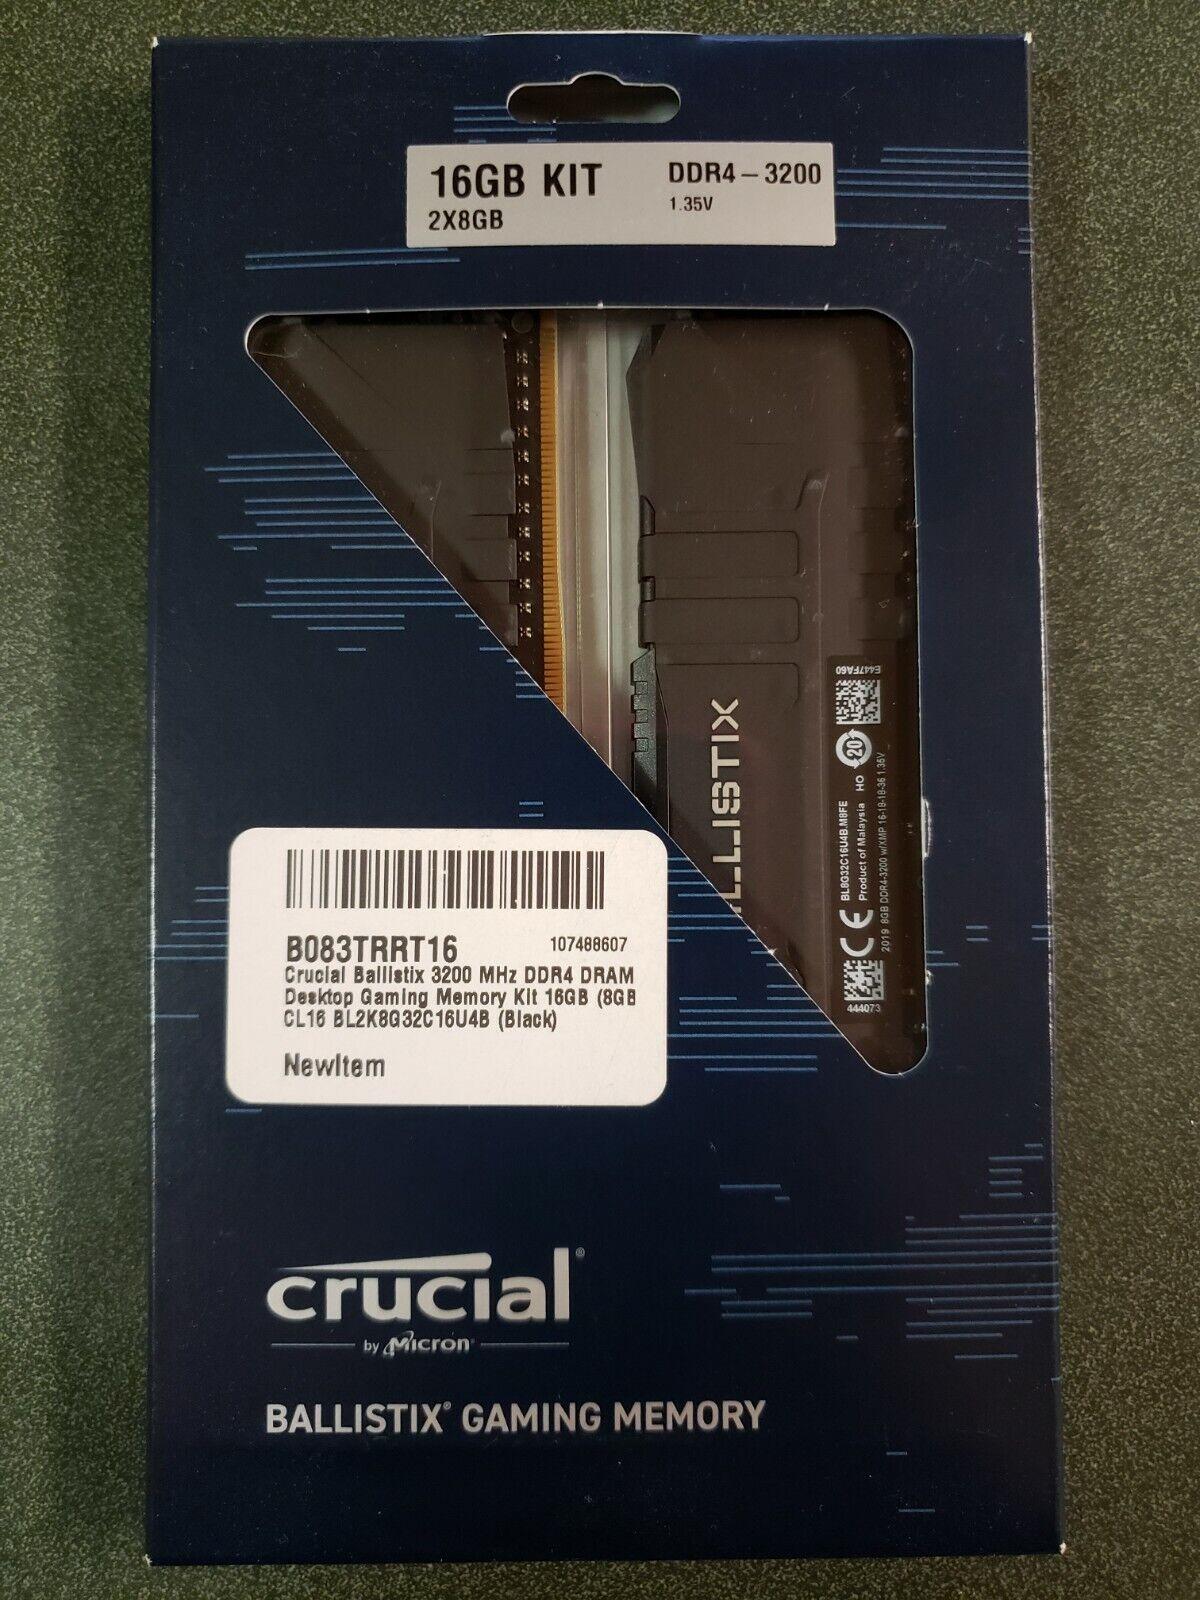 Crucial Ballistix 16GB Kit (2 x 8GB) DDR4-3200 Desktop Gaming Memory CL16. Buy it now for 60.00